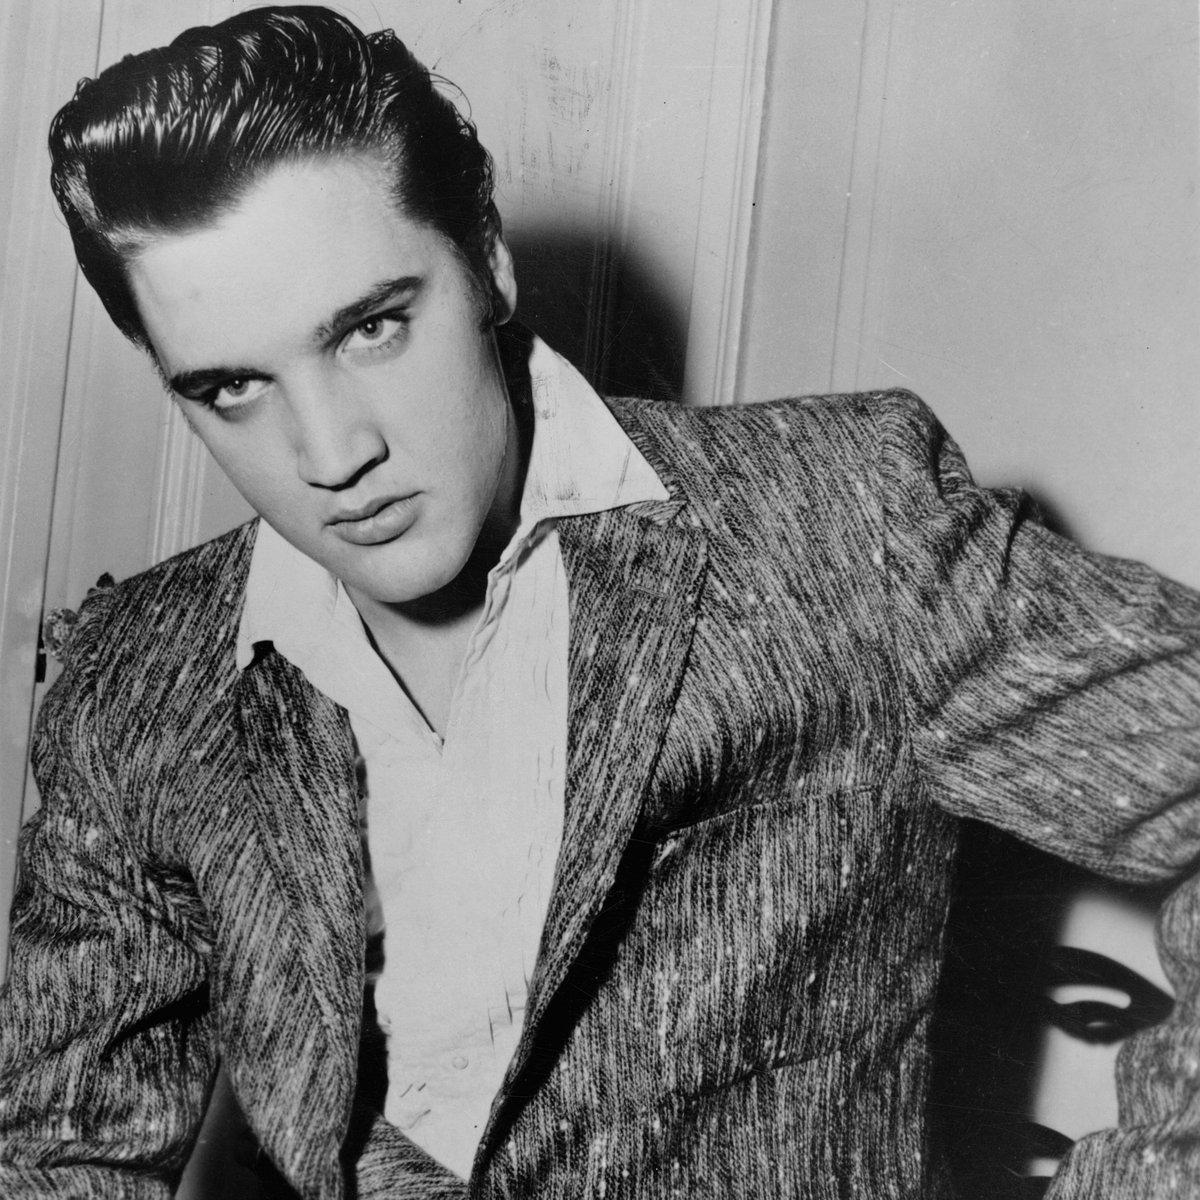 Broke the rules, then broke the records. #TheKing #Elvis <br>http://pic.twitter.com/AZ34CfNkux